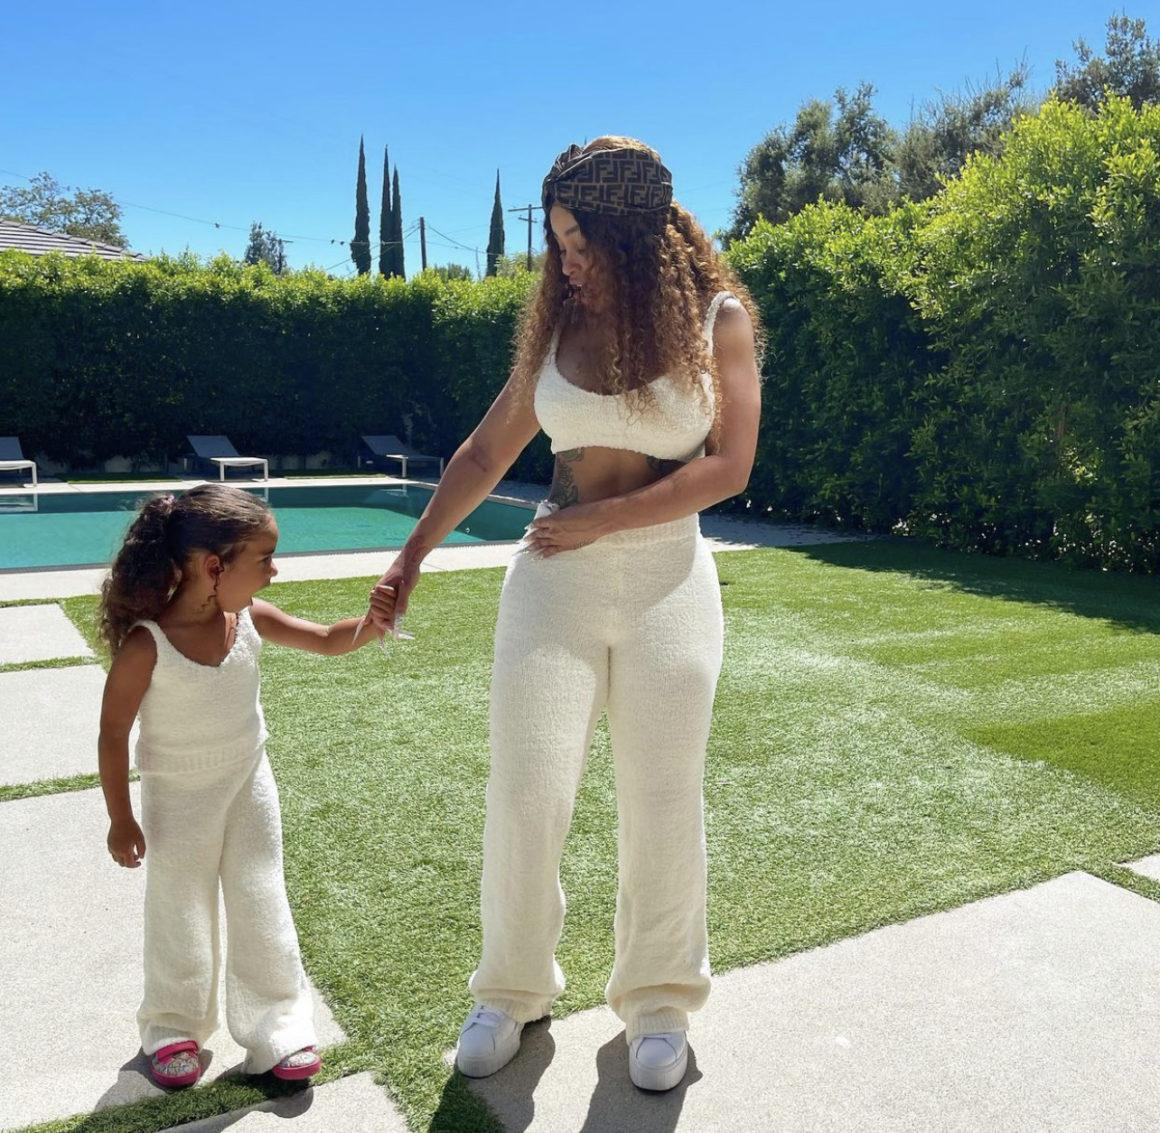 Blac Chyna and Dream Kardashian Spotted Twinning in Fashion Nova White Fuzzy Sets